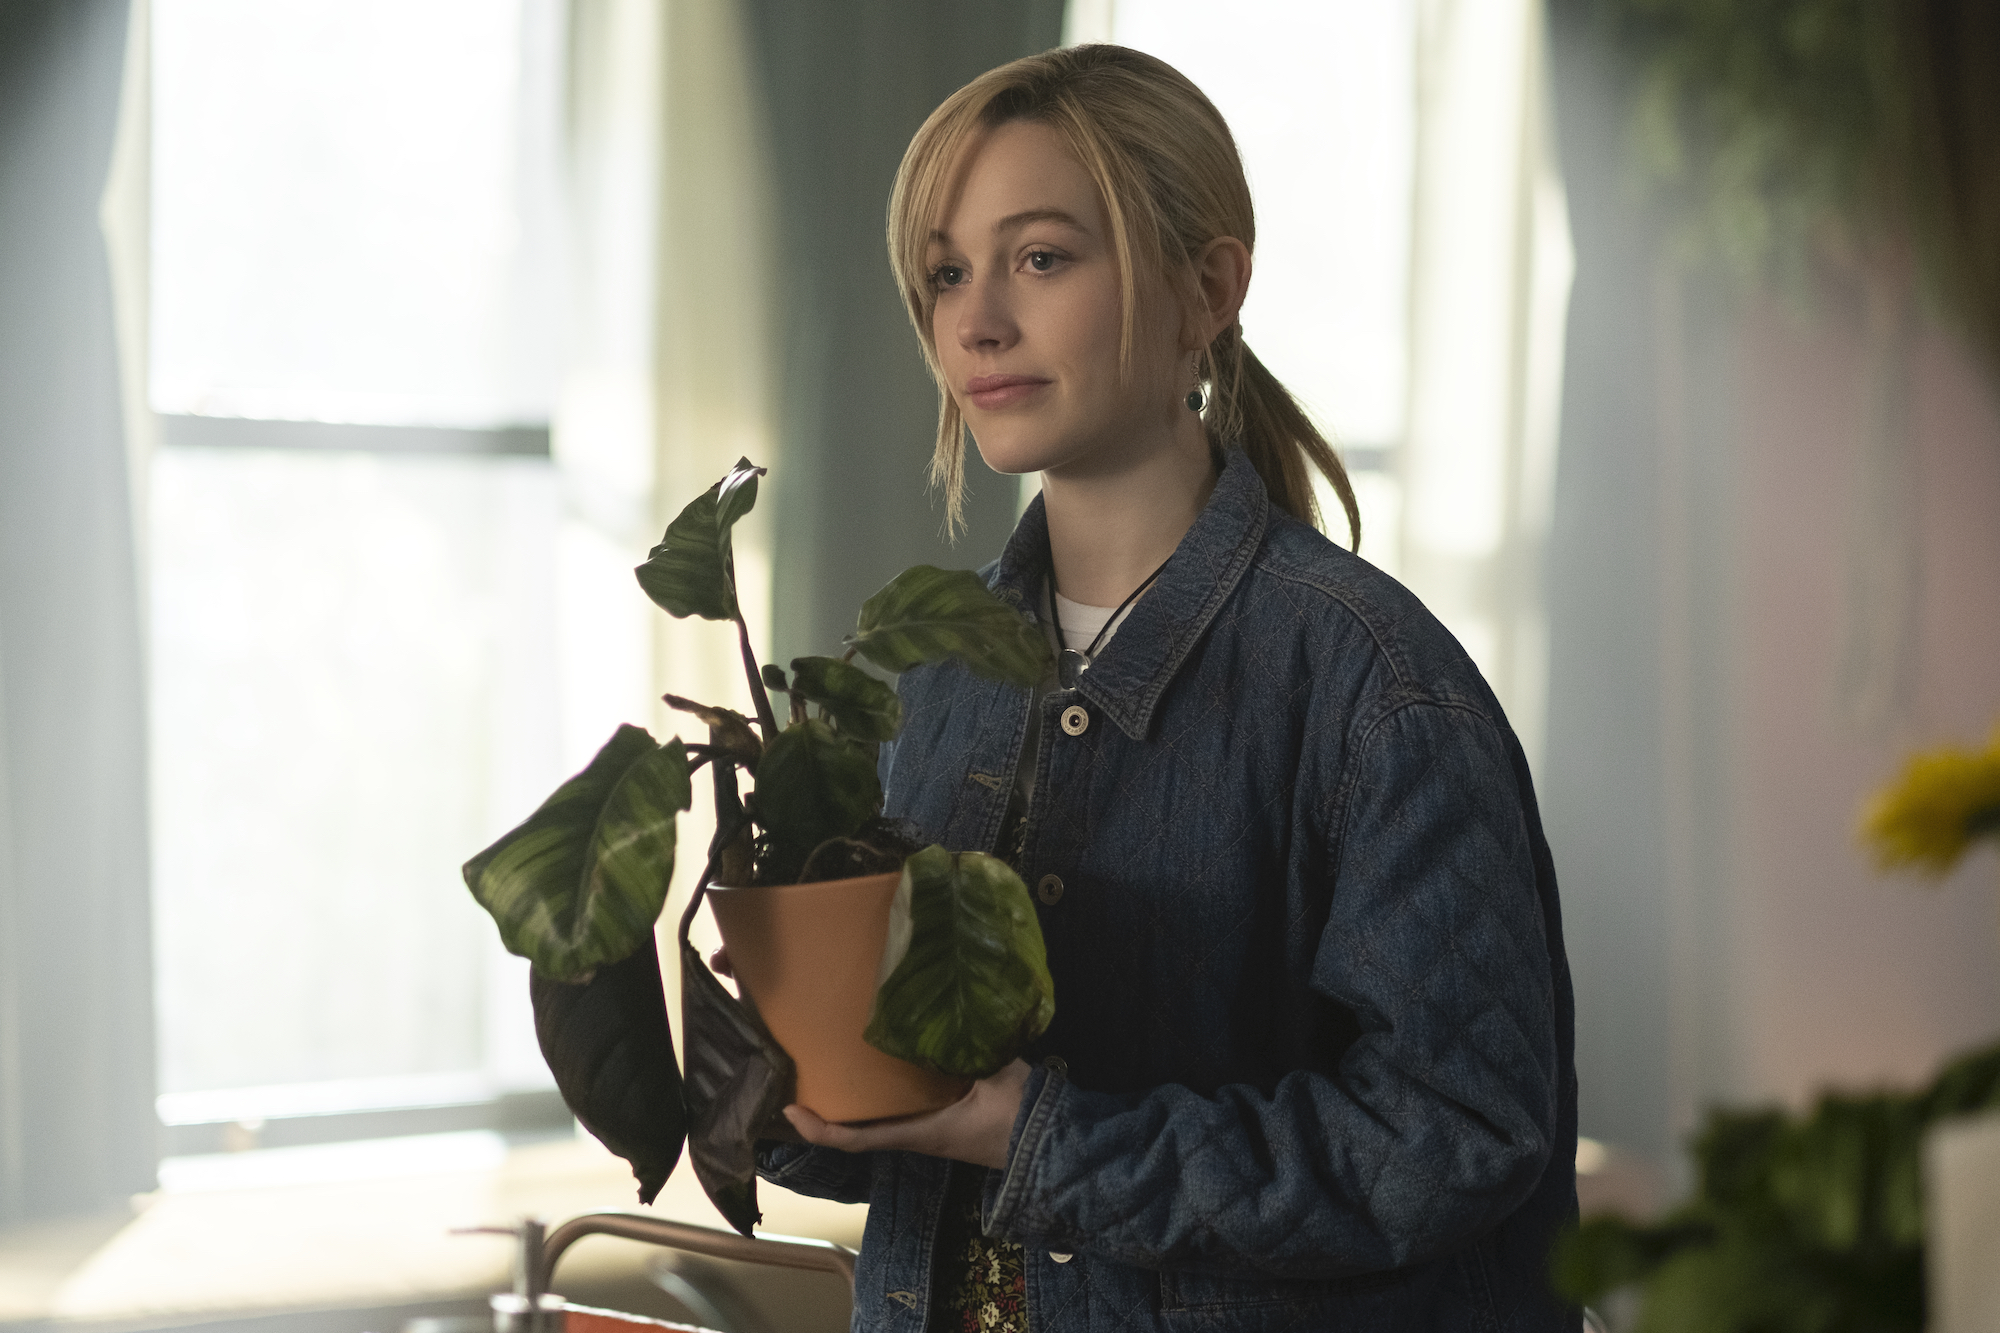 Victoria Pedretti as Dani in 'THE HAUNTING OF BLY MANOR.'